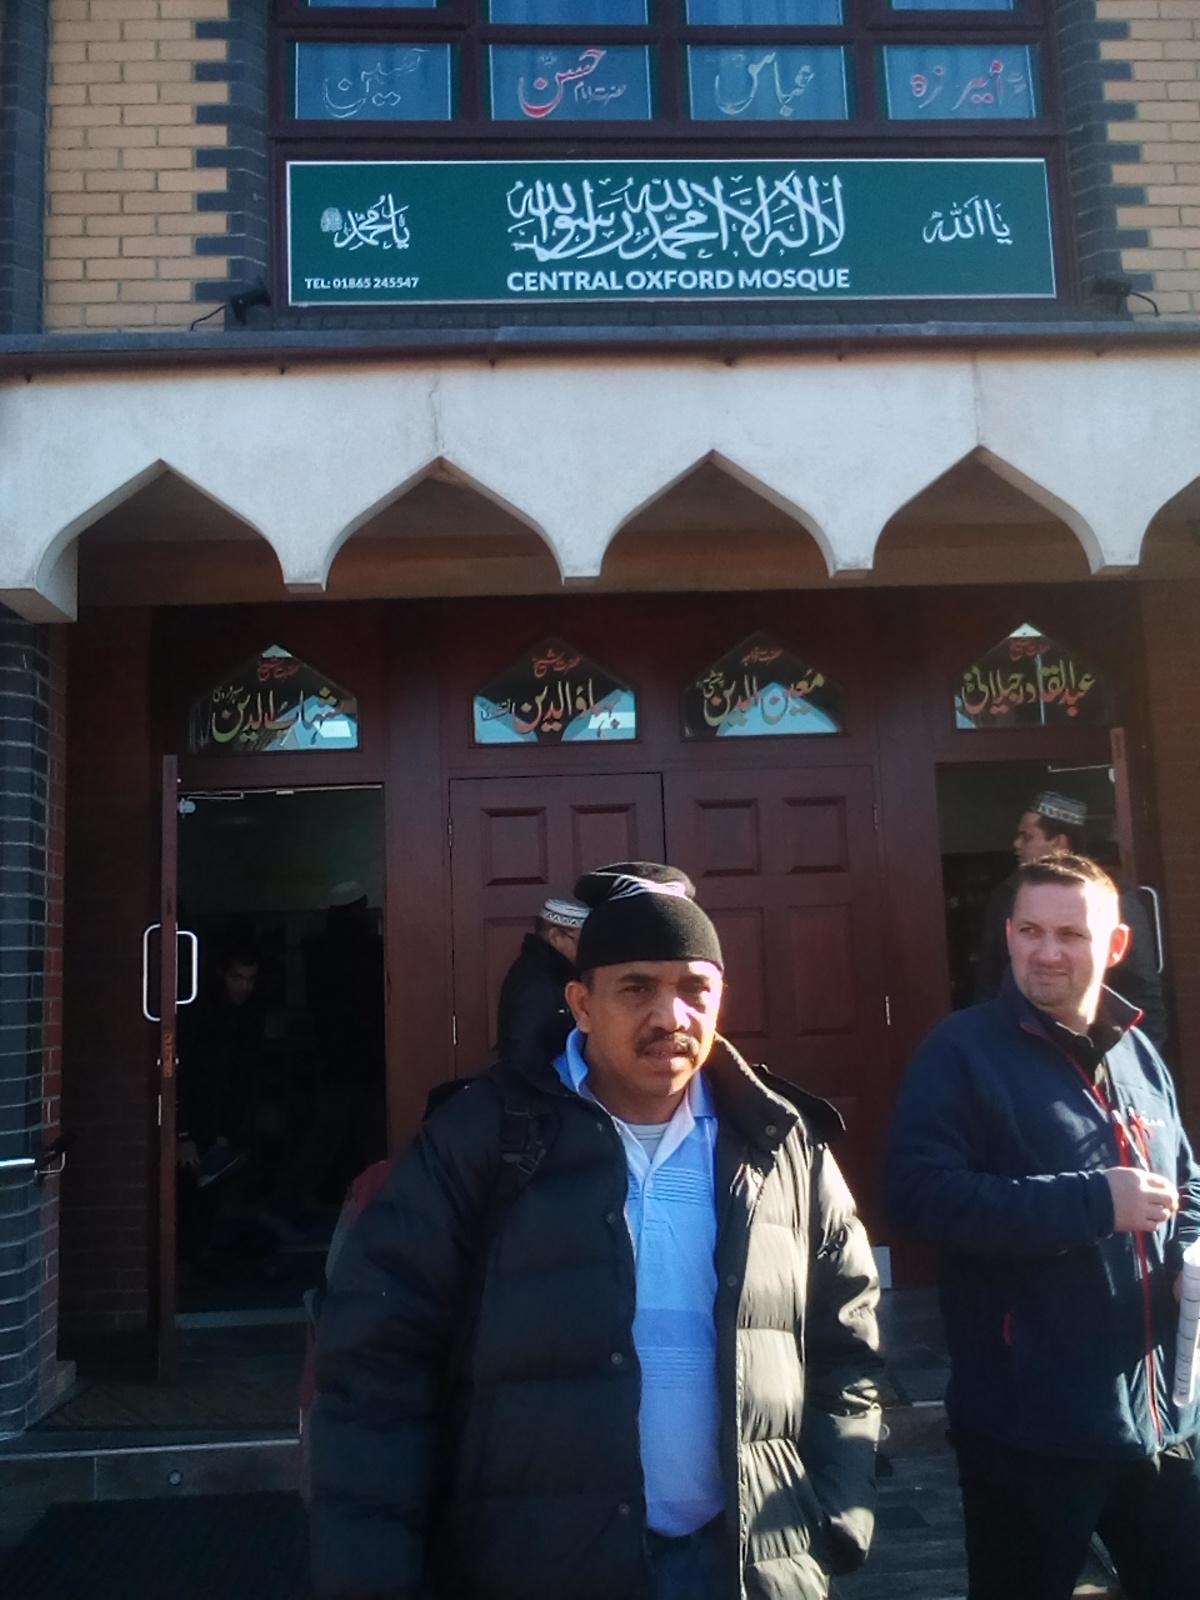 boxford muslim Nh gun shop ~ merrimack firearms, new hampshire's favorite gun shop & firearms dealer: guns, long guns, rifles, pistols, revolvers, firearms & firearms training.